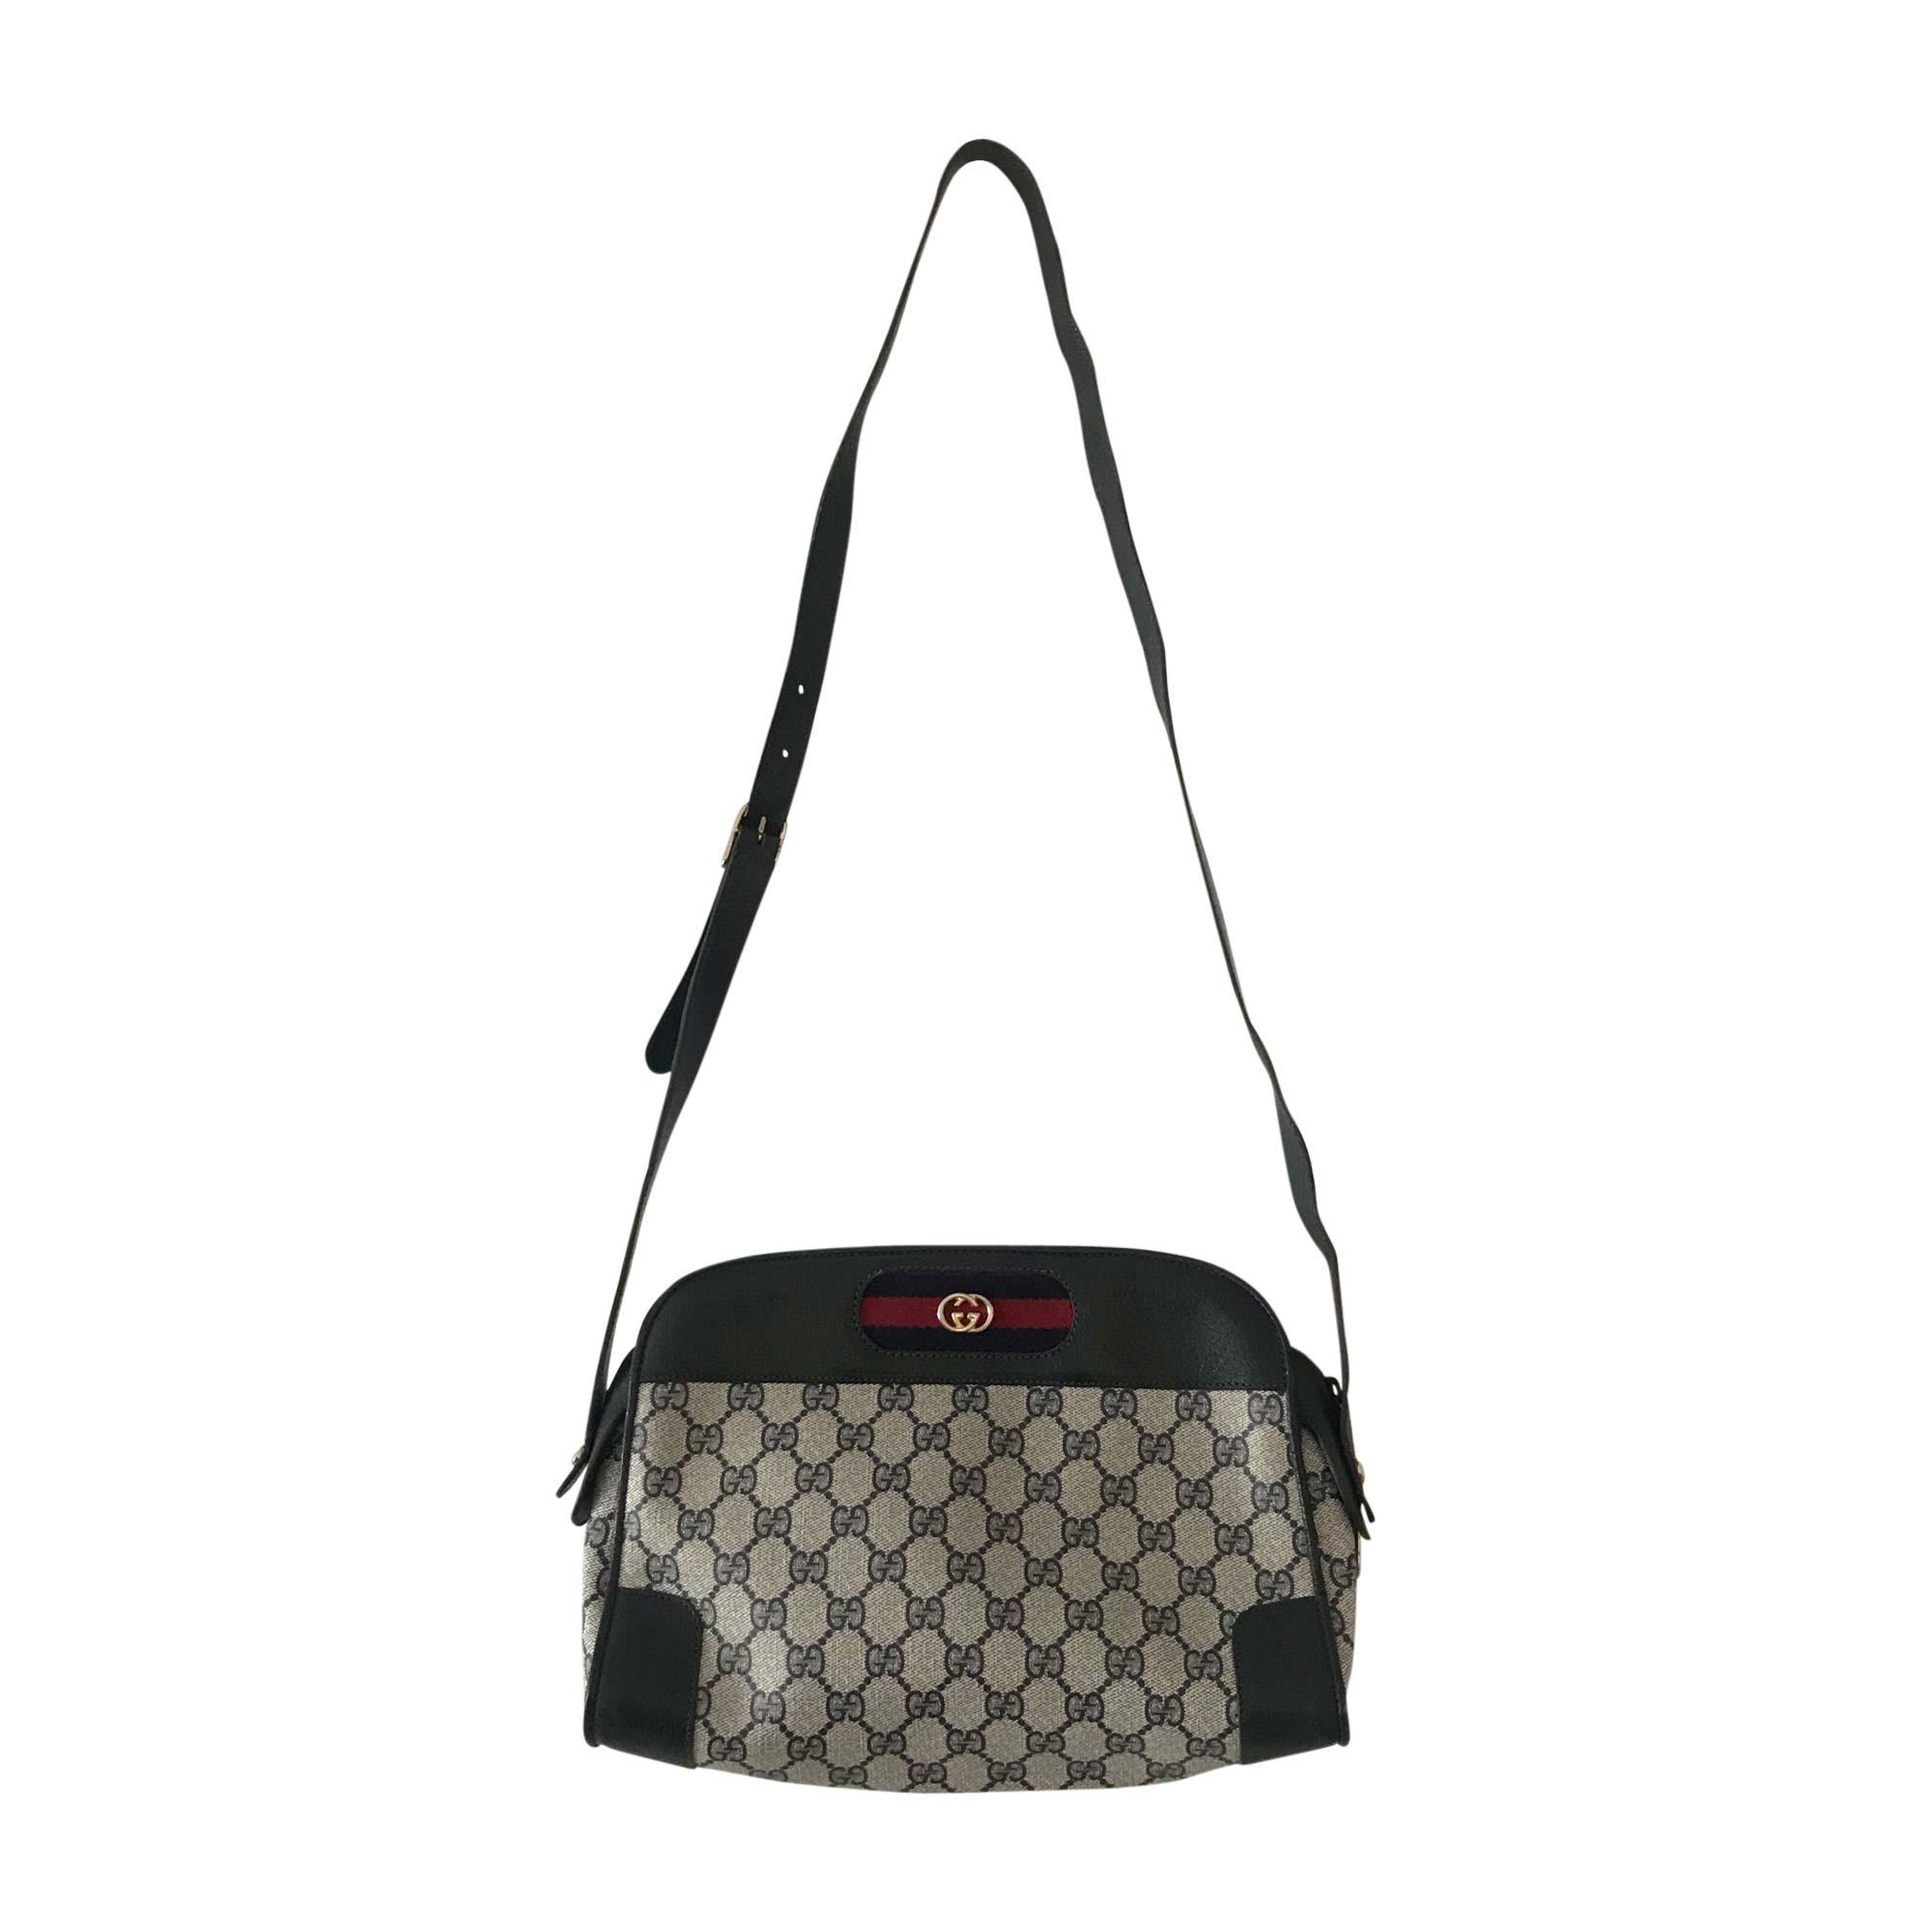 leather shoulder bag gucci beige vendu par delphine 4218 - 7501045